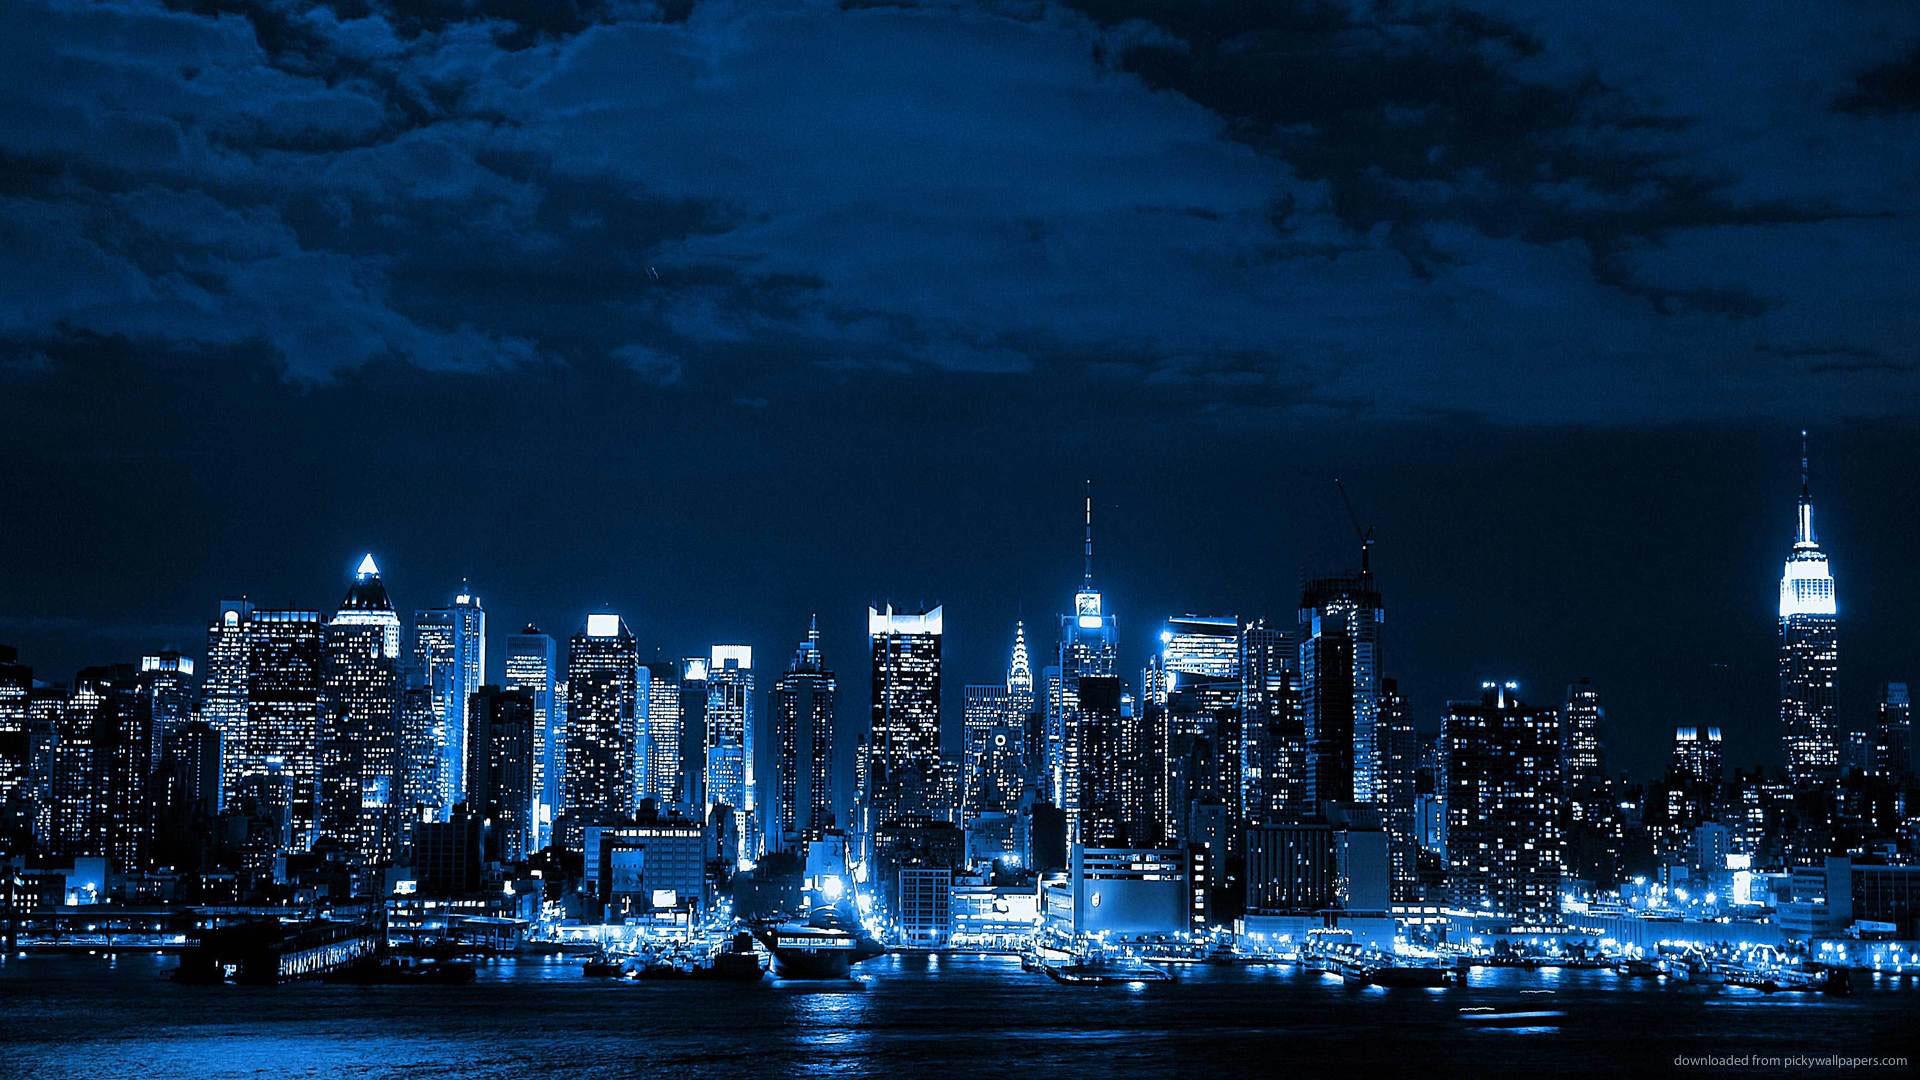 hd pics photos blue neon city desktop background wallpaper